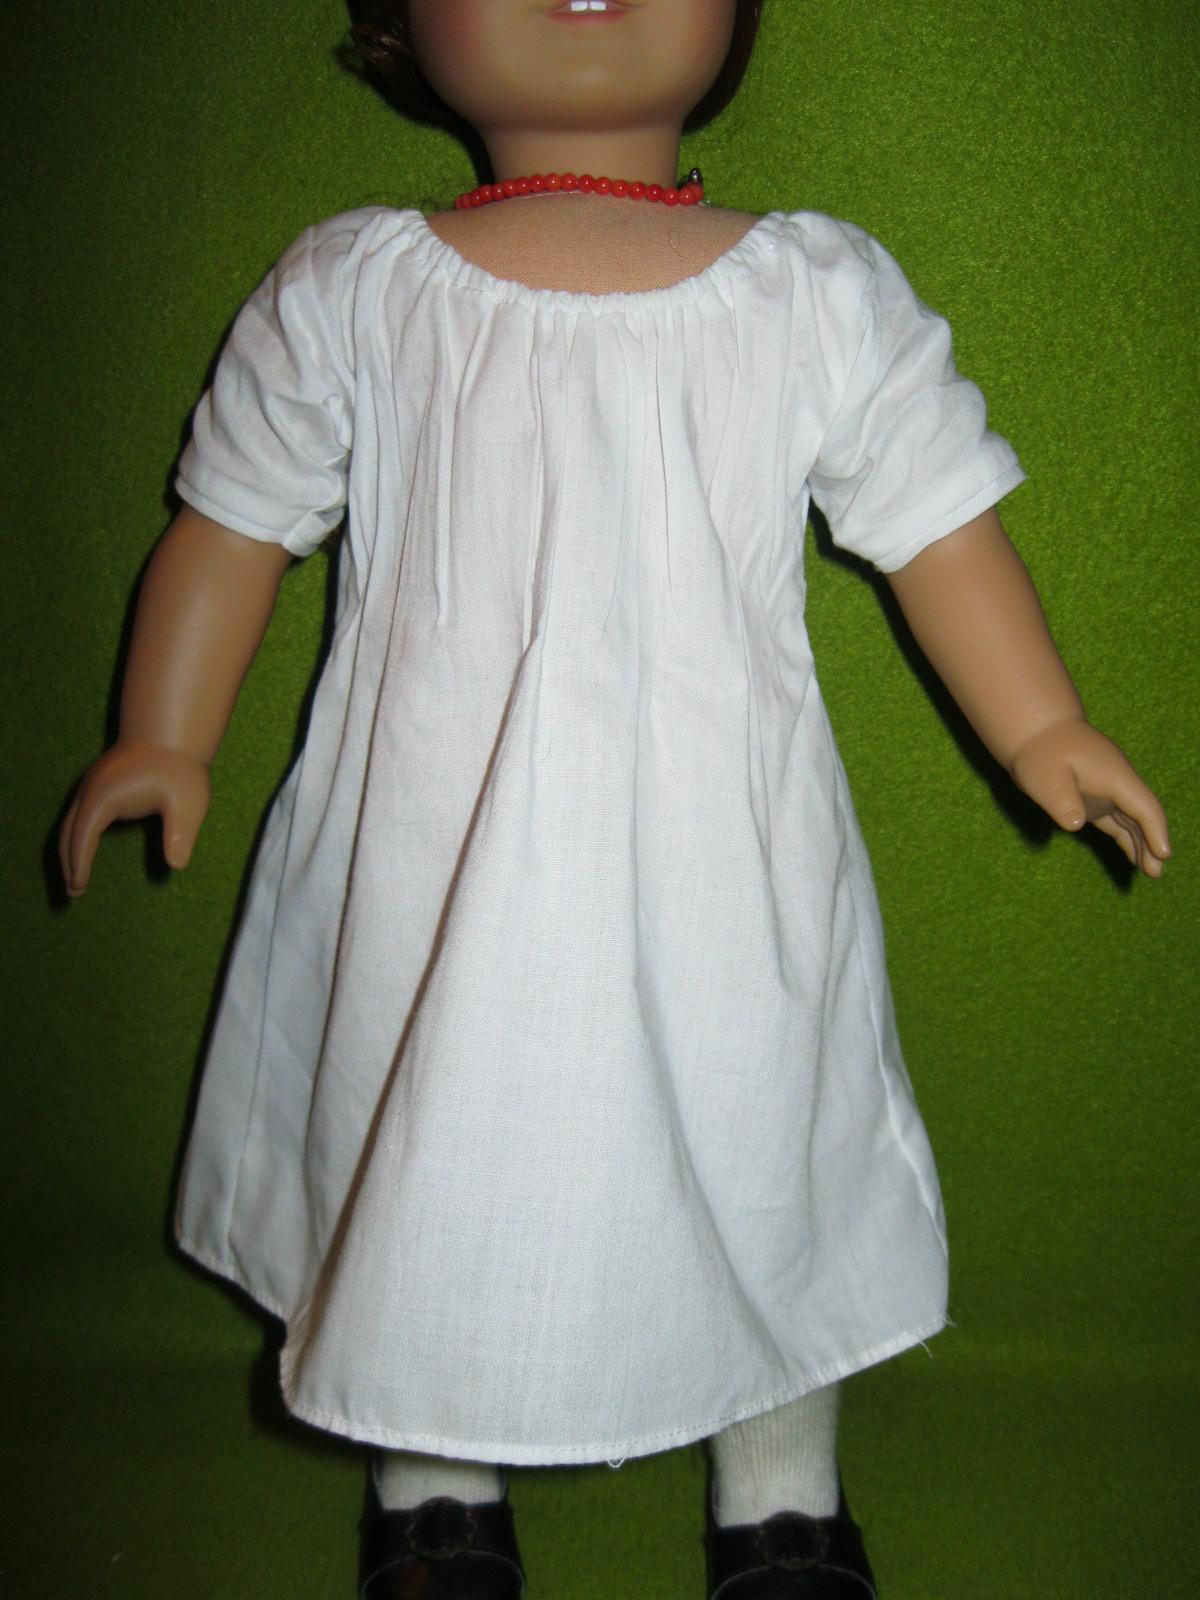 Felicity Merriman Doll American Girl Wiki